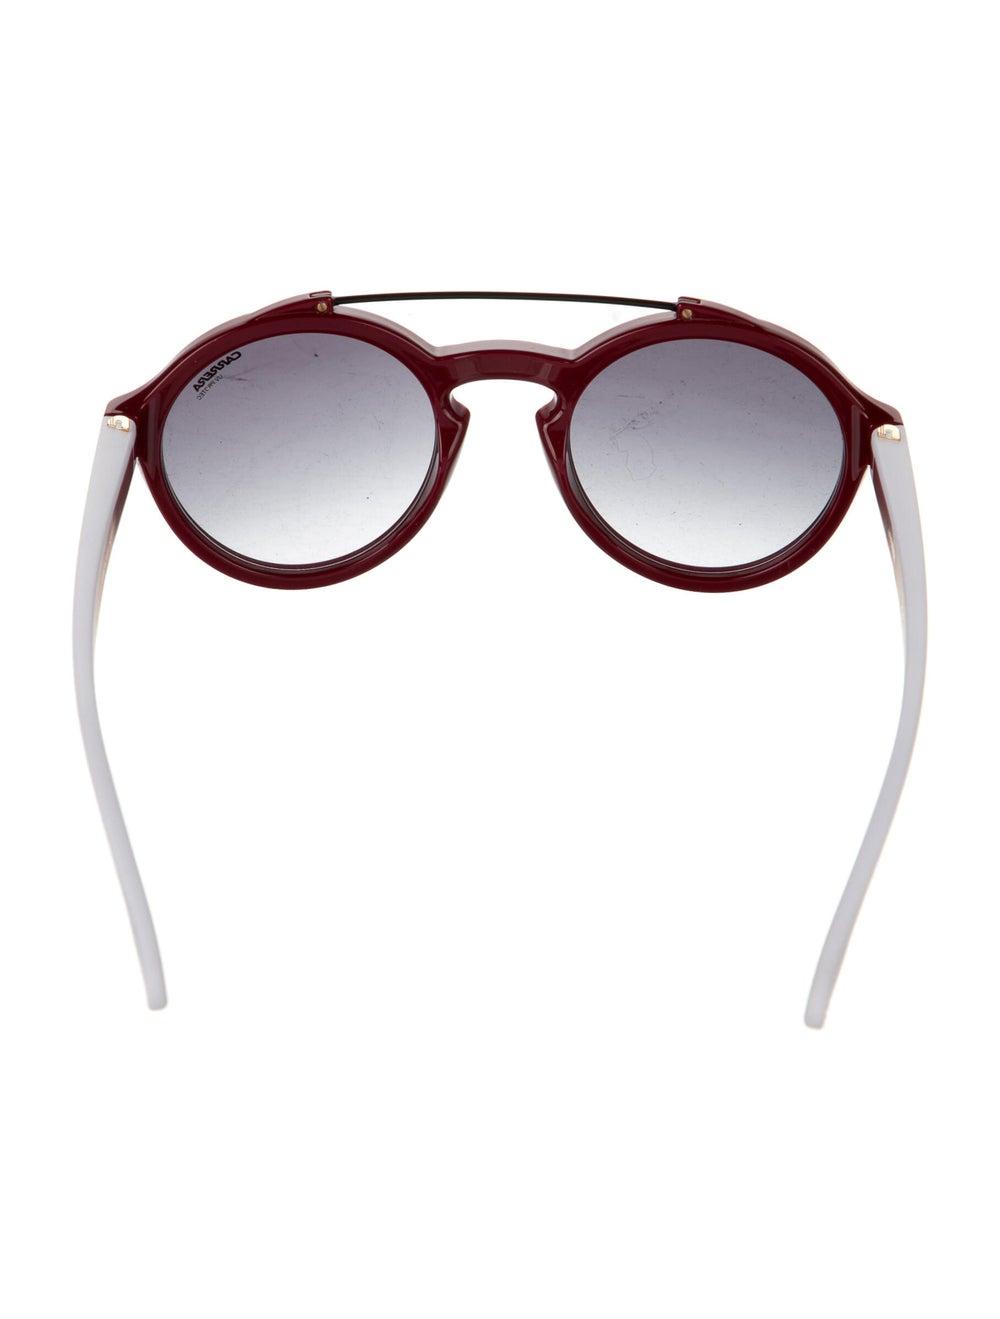 Carrera Round Gradient Round Sunglasses Red - image 3